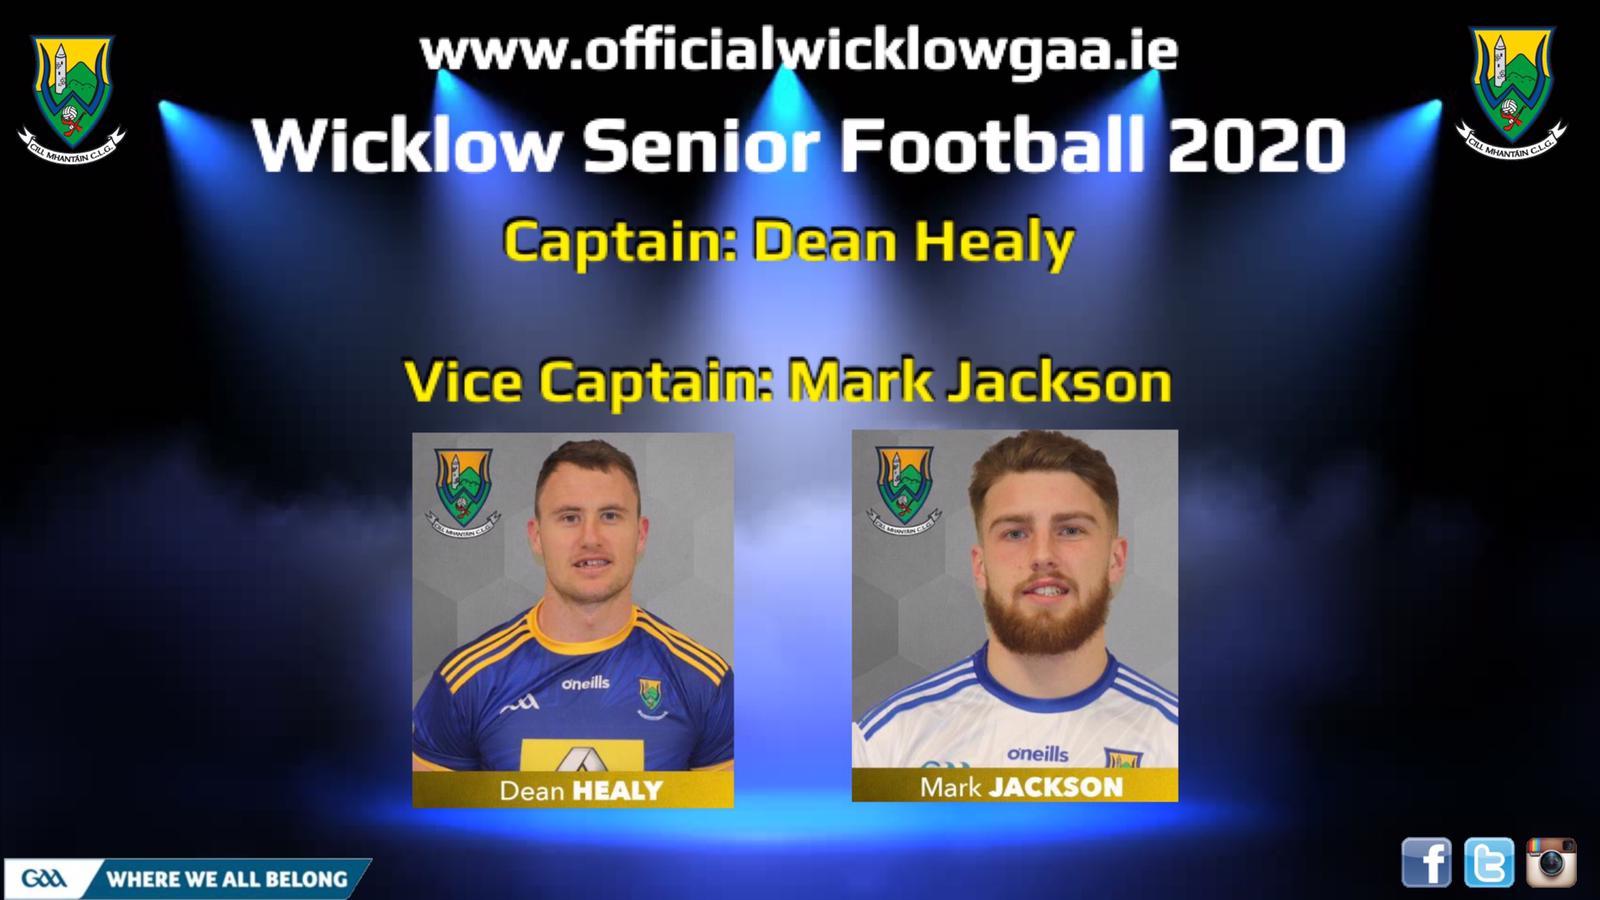 Wicklow Senior Football Captain 2020 announced